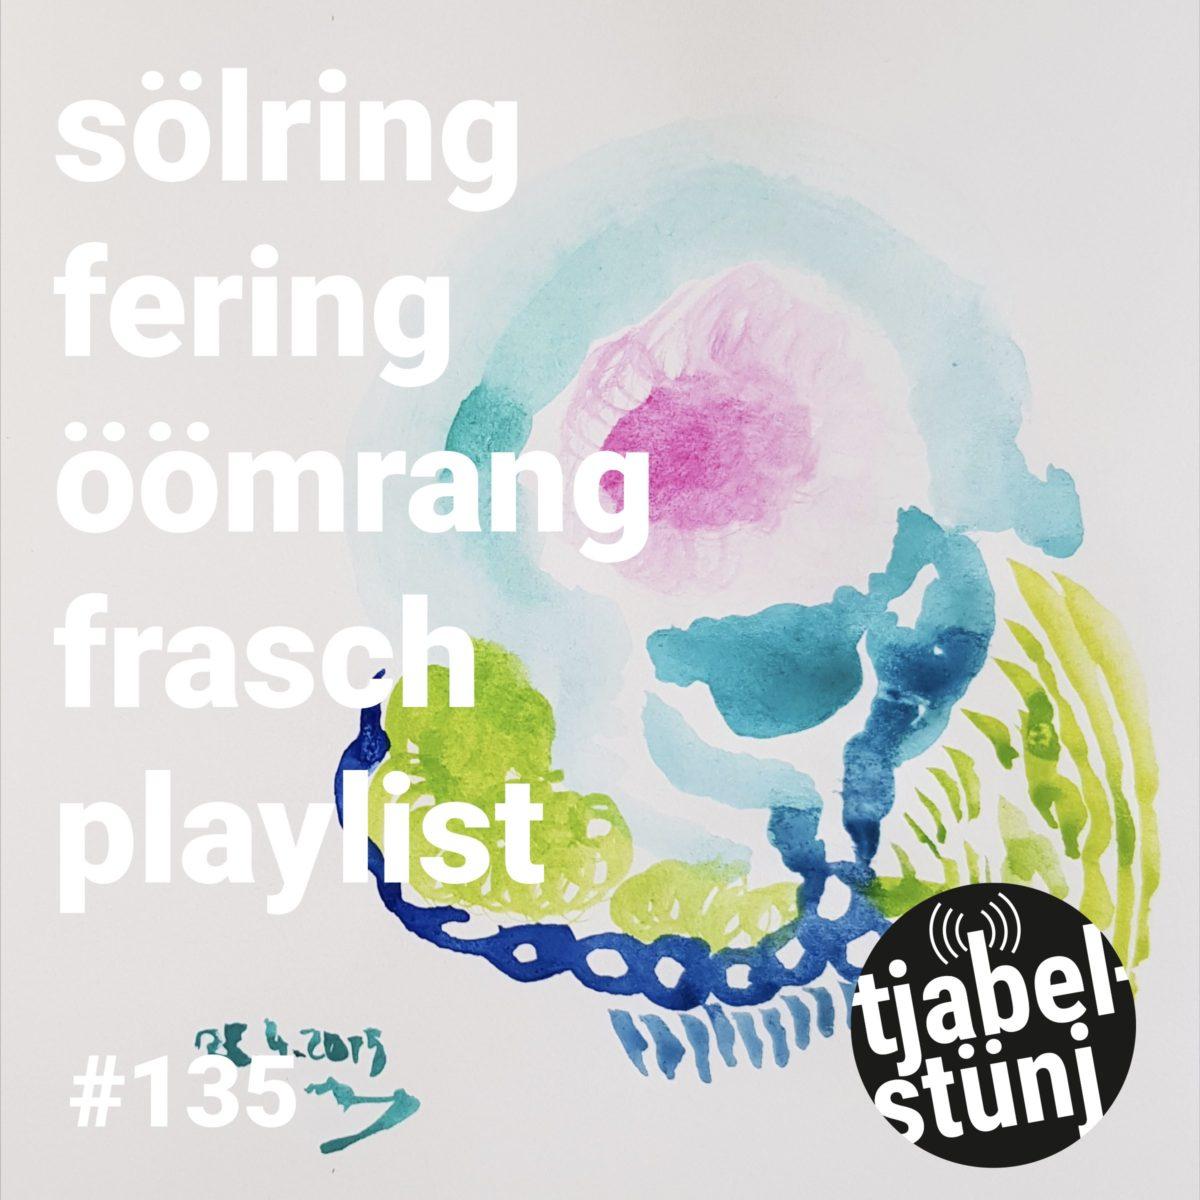 Playlist #135